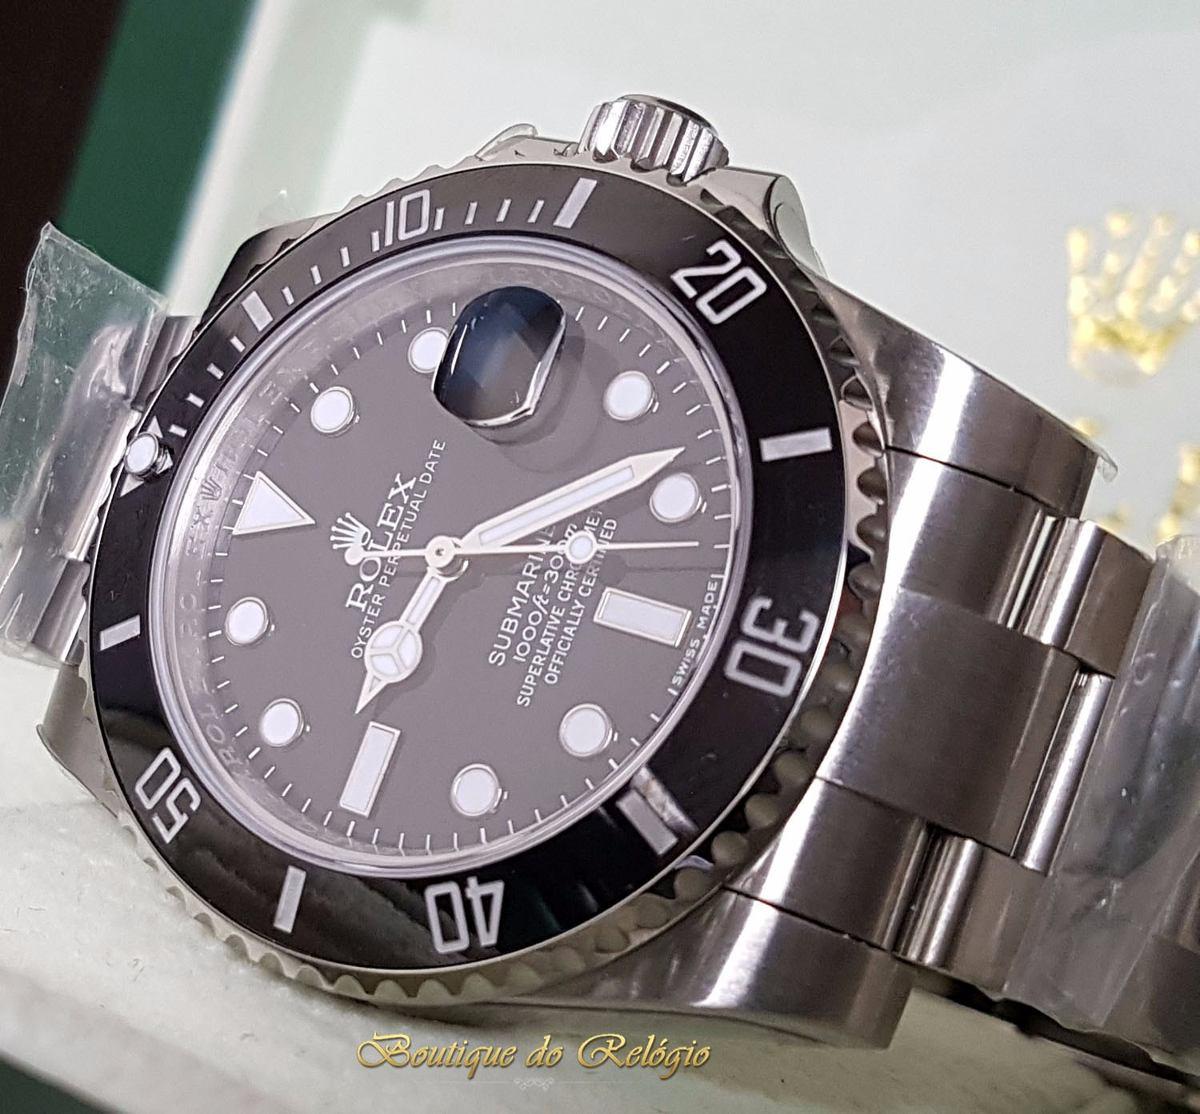 f8b712d98d3 Relógio Eta Sa3135 Submariner Preto Noob Best Edition V7 - R  2.999 ...